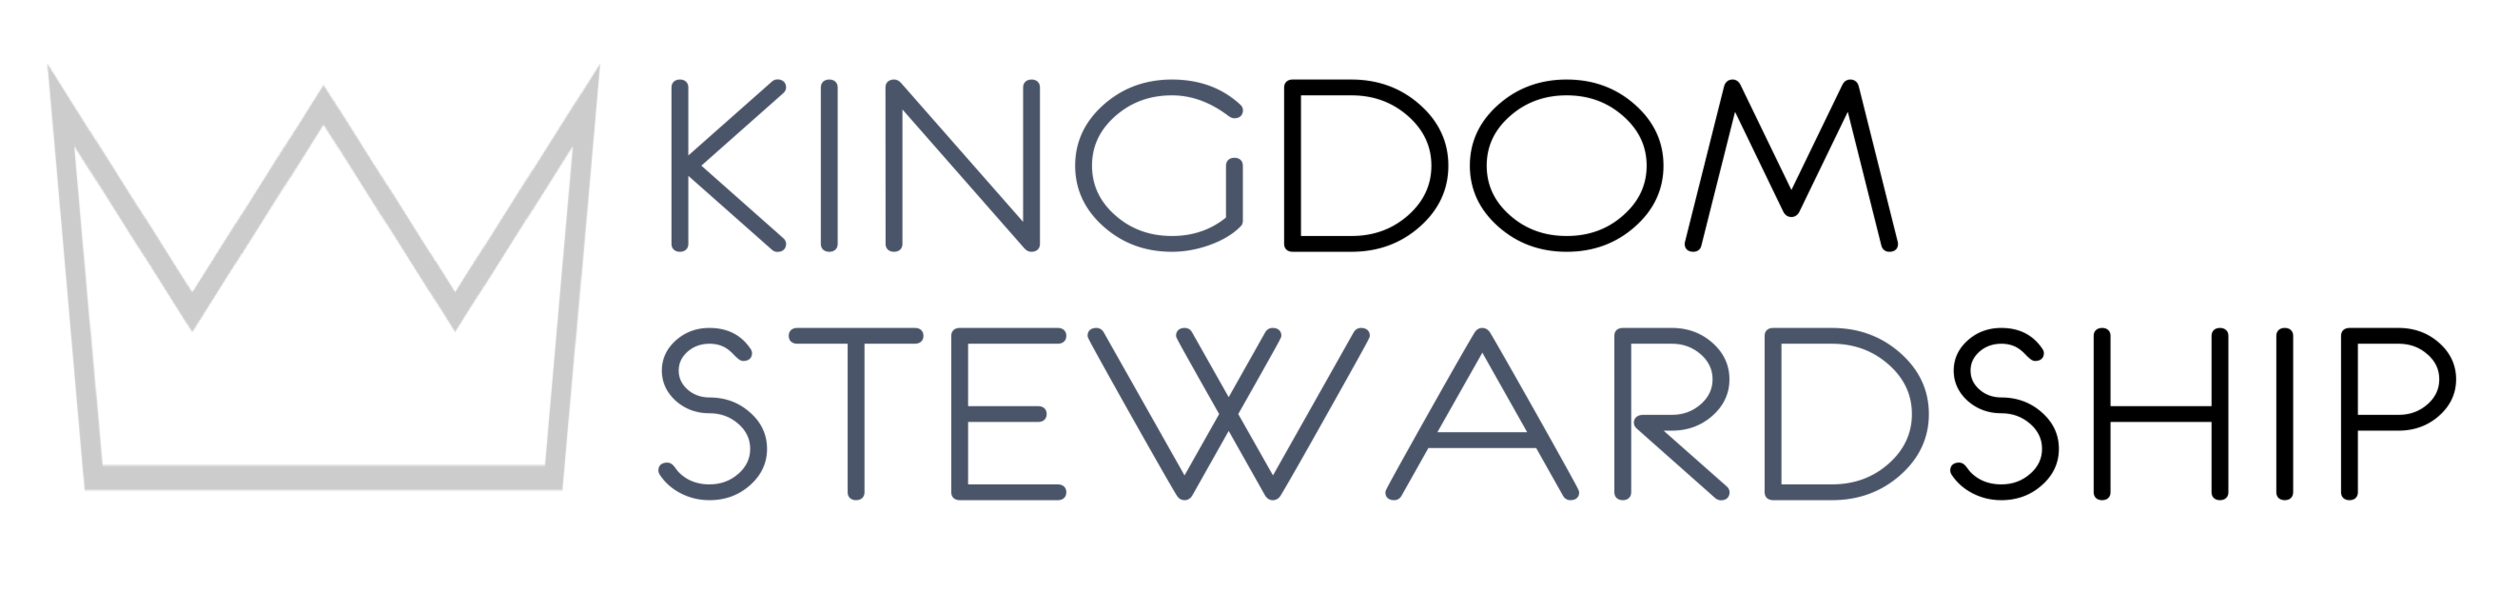 Kingdom Stewardship Brand - Simple.png